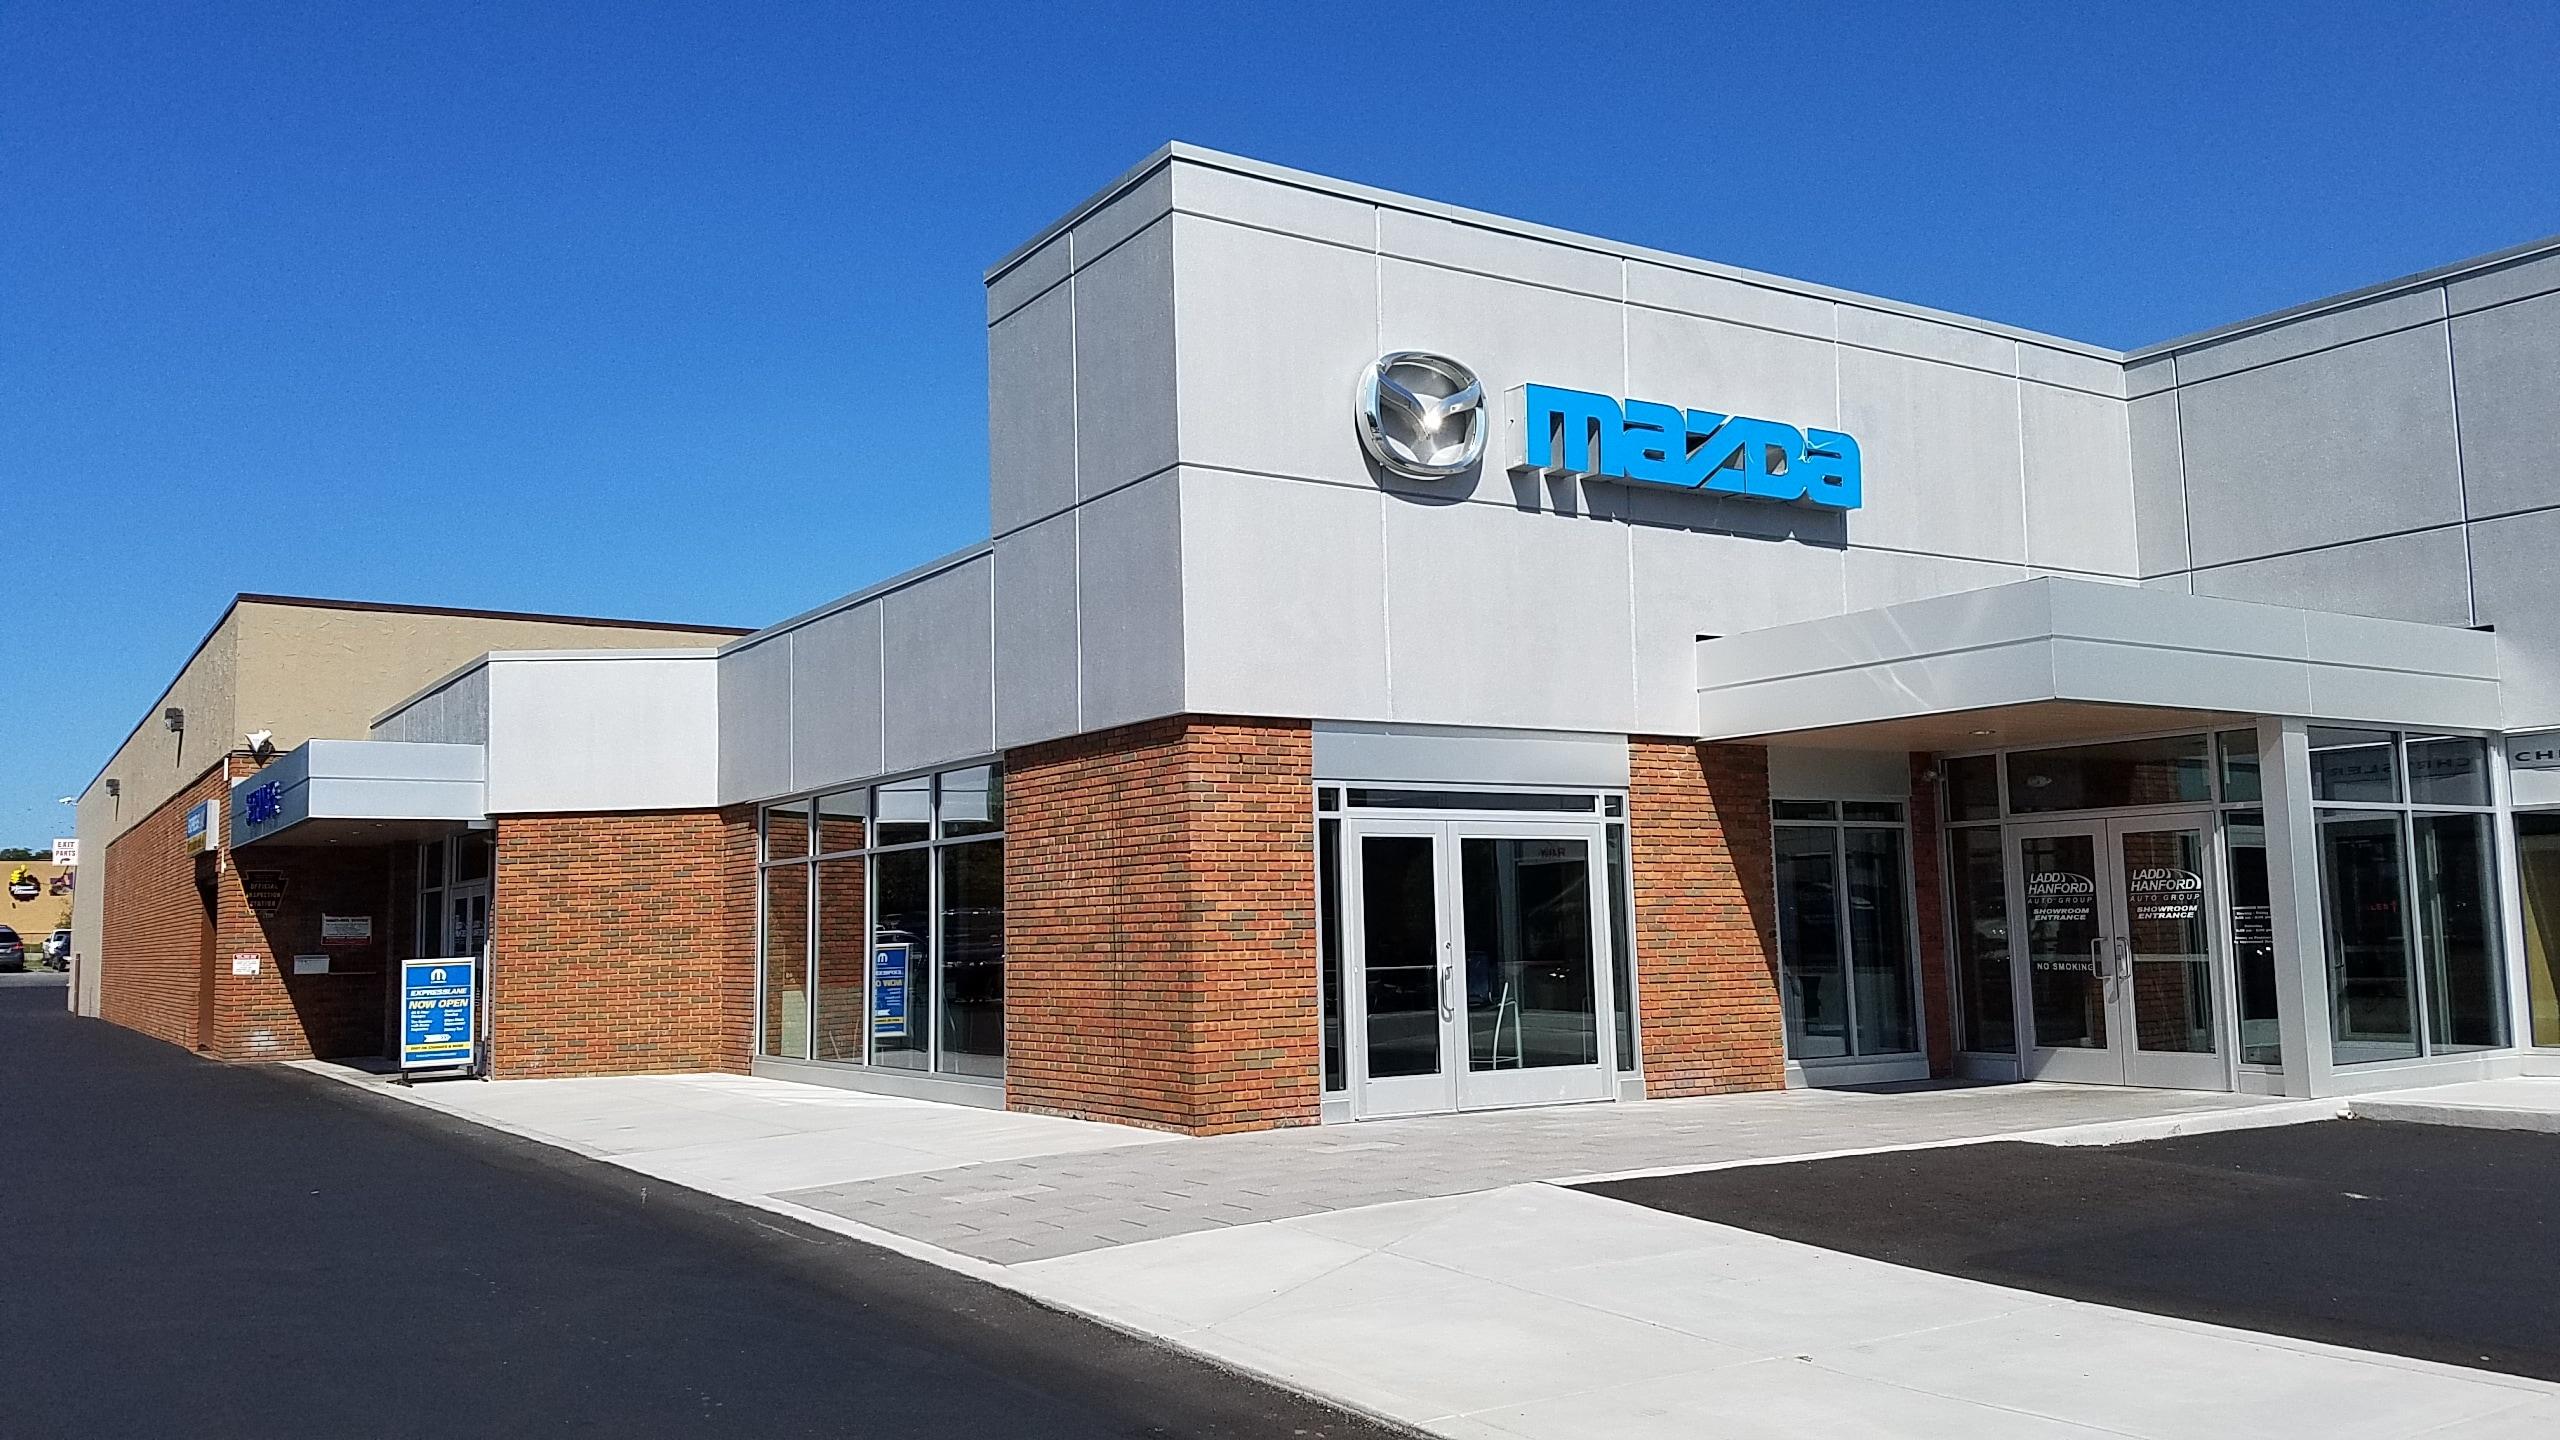 mazda york used dealership new pa in source chevrolet cruze apple harrisburg dealer for